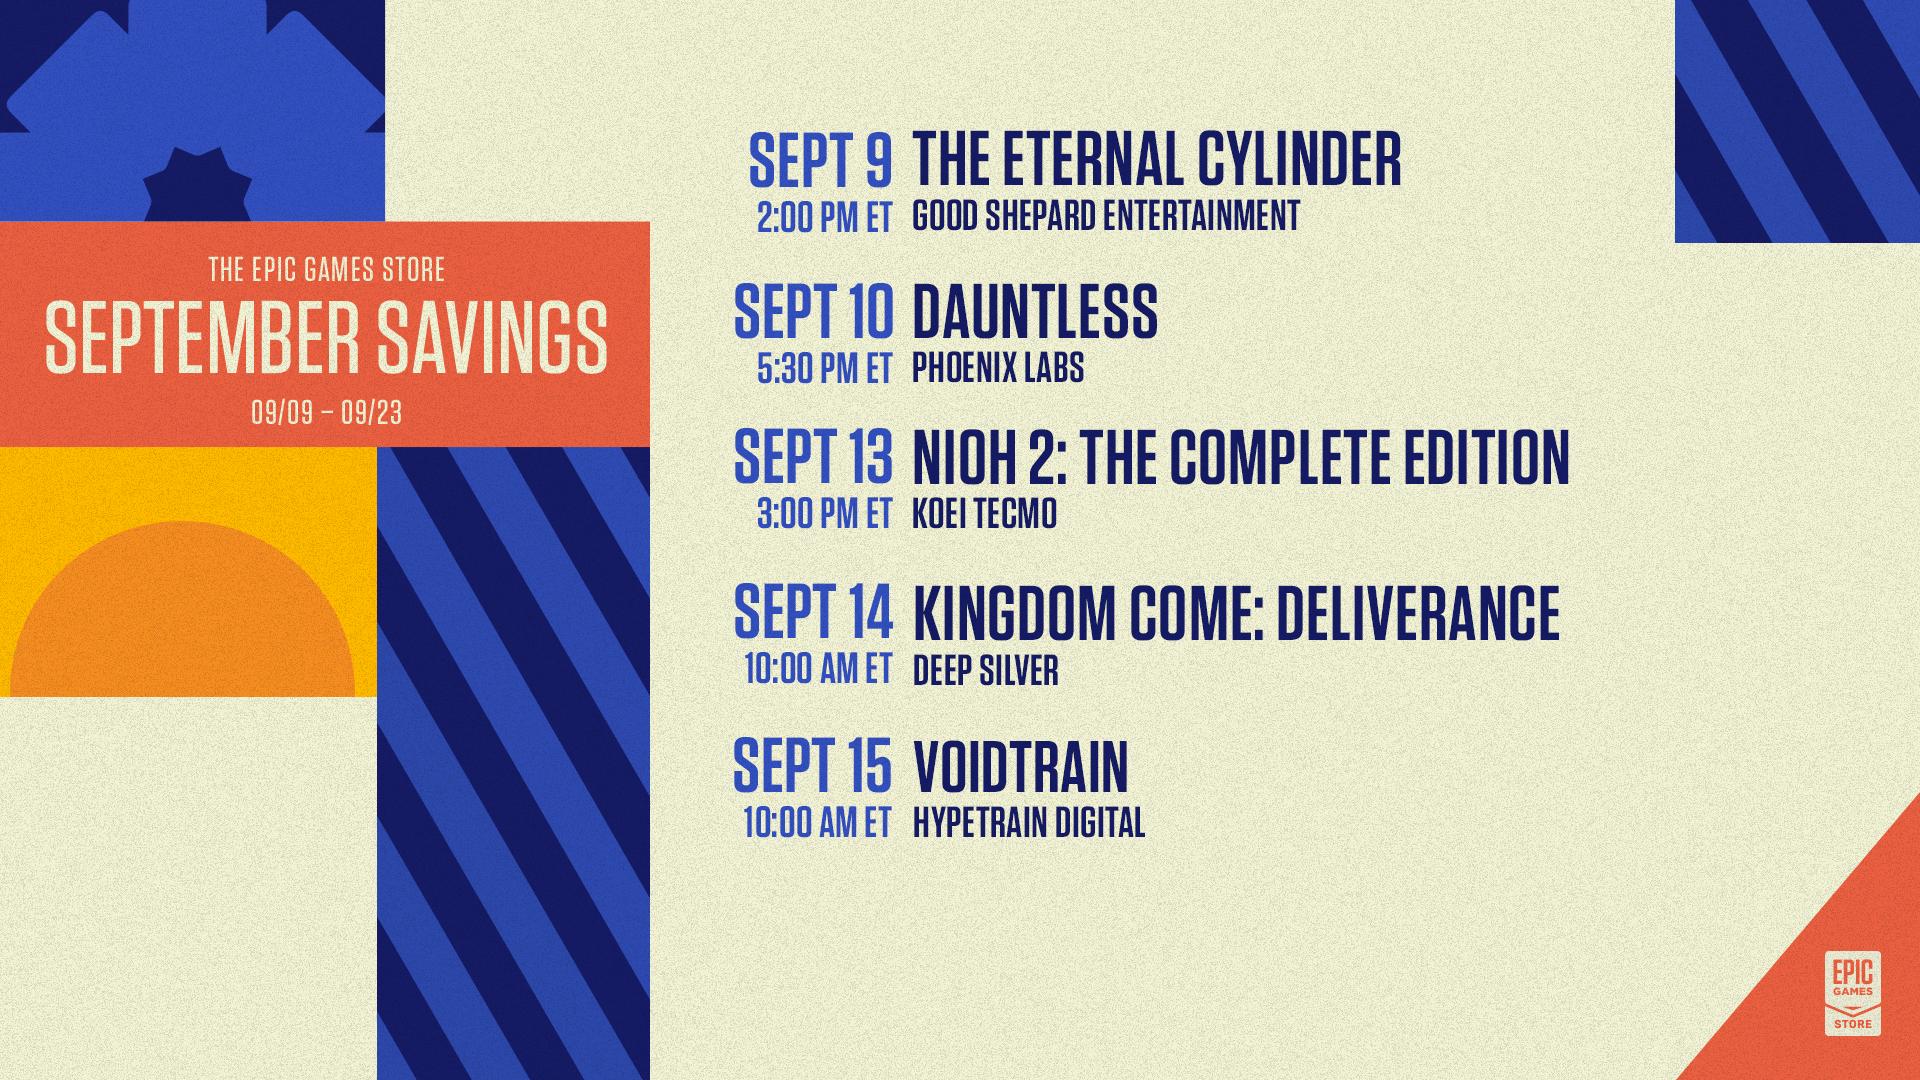 SeptSavings Twitch Week1 Schedule